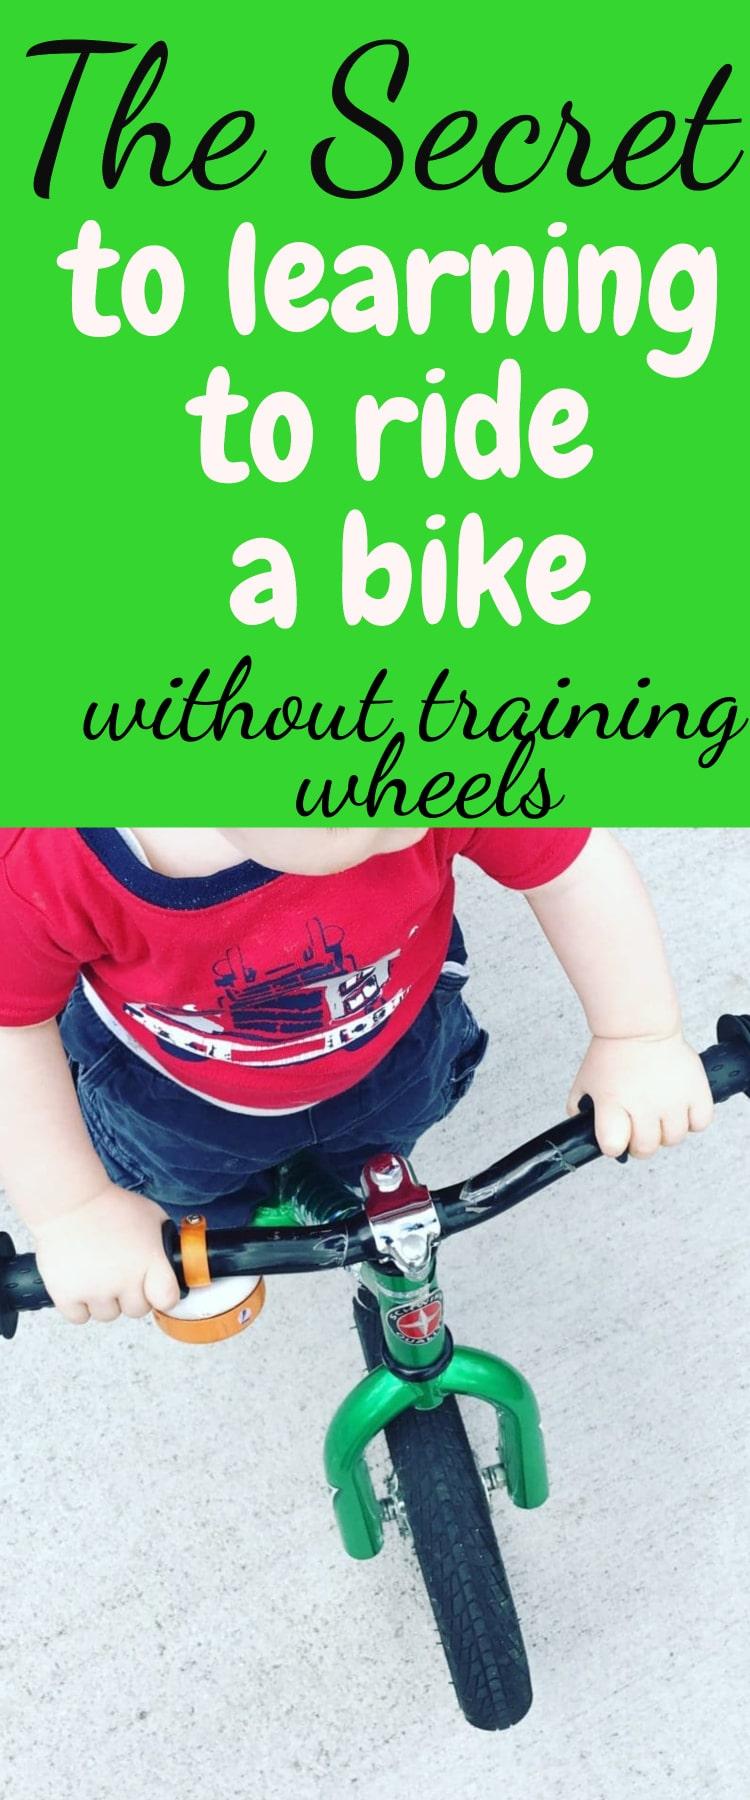 balance bike / children / childhood / kids / bike riding / balance bike / toddler gifts / gift ideas #kids #bikeriding #bikes #kidsgifts #toddler #preschooler  via @clarkscondensed